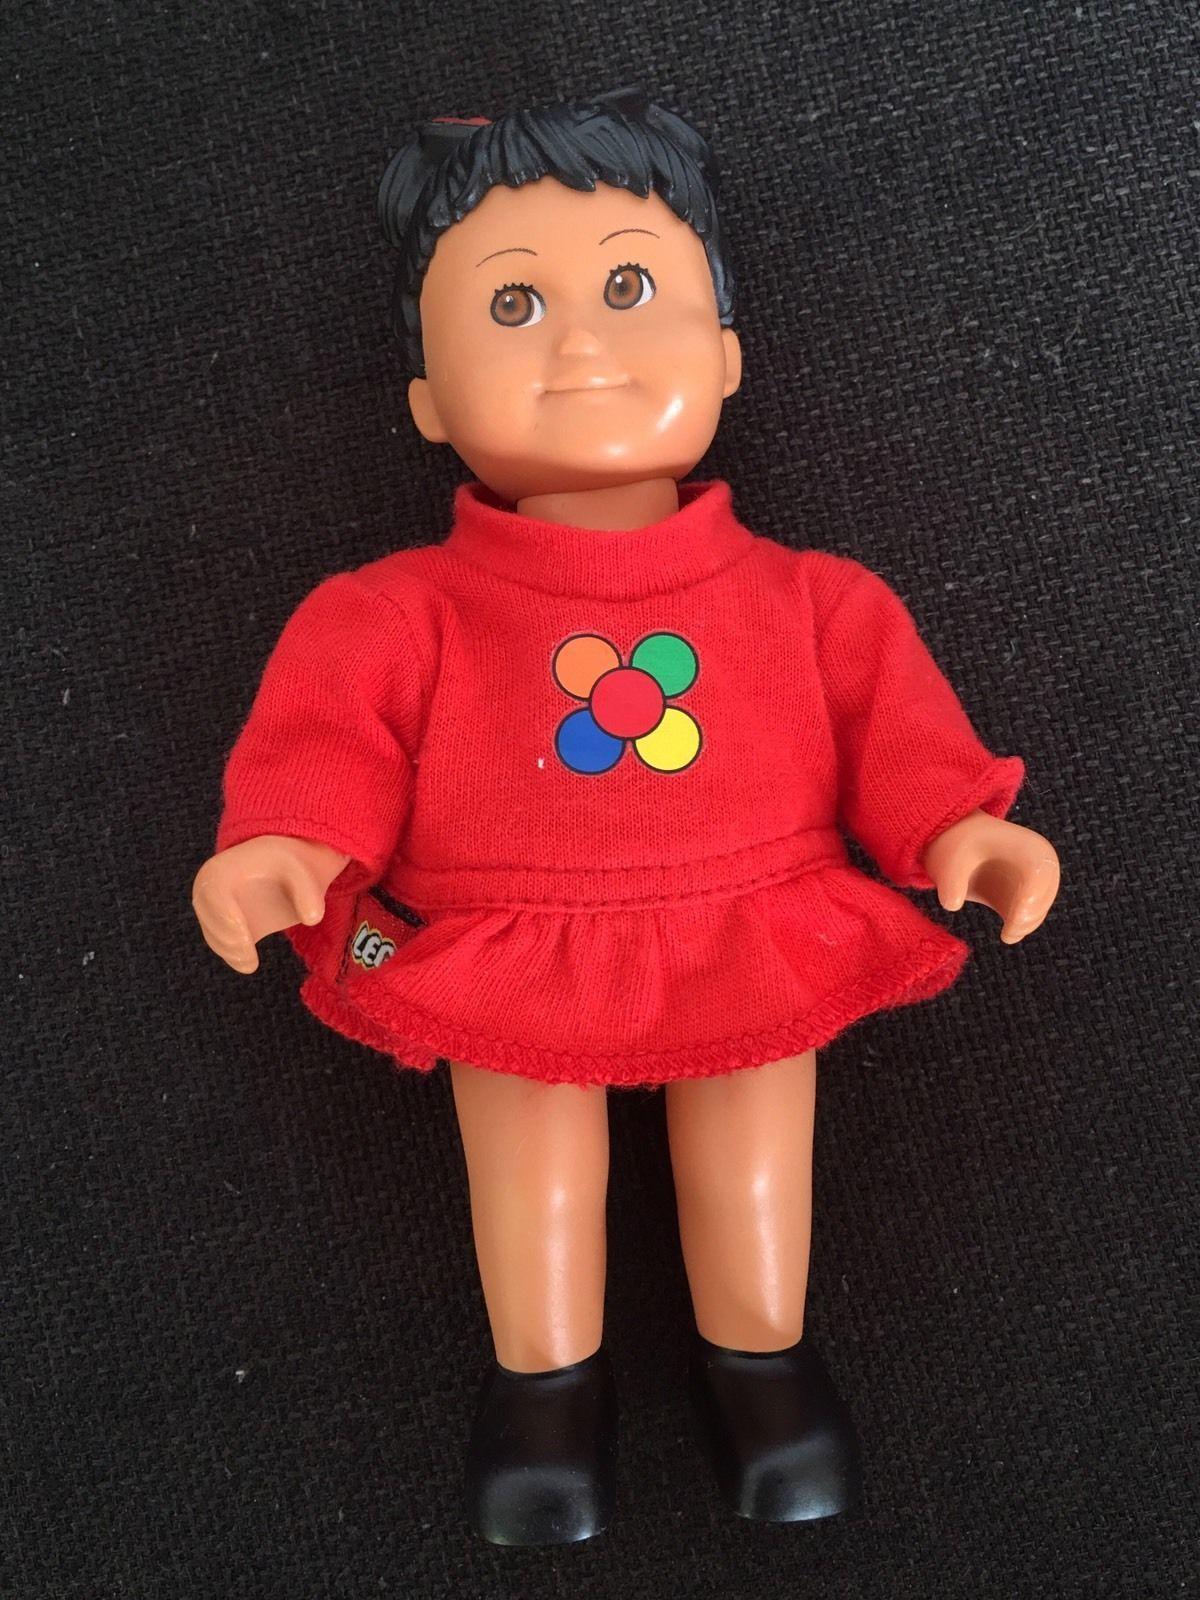 Mädchen Marie Figur große Puppe Education 2952 Lego Duplo